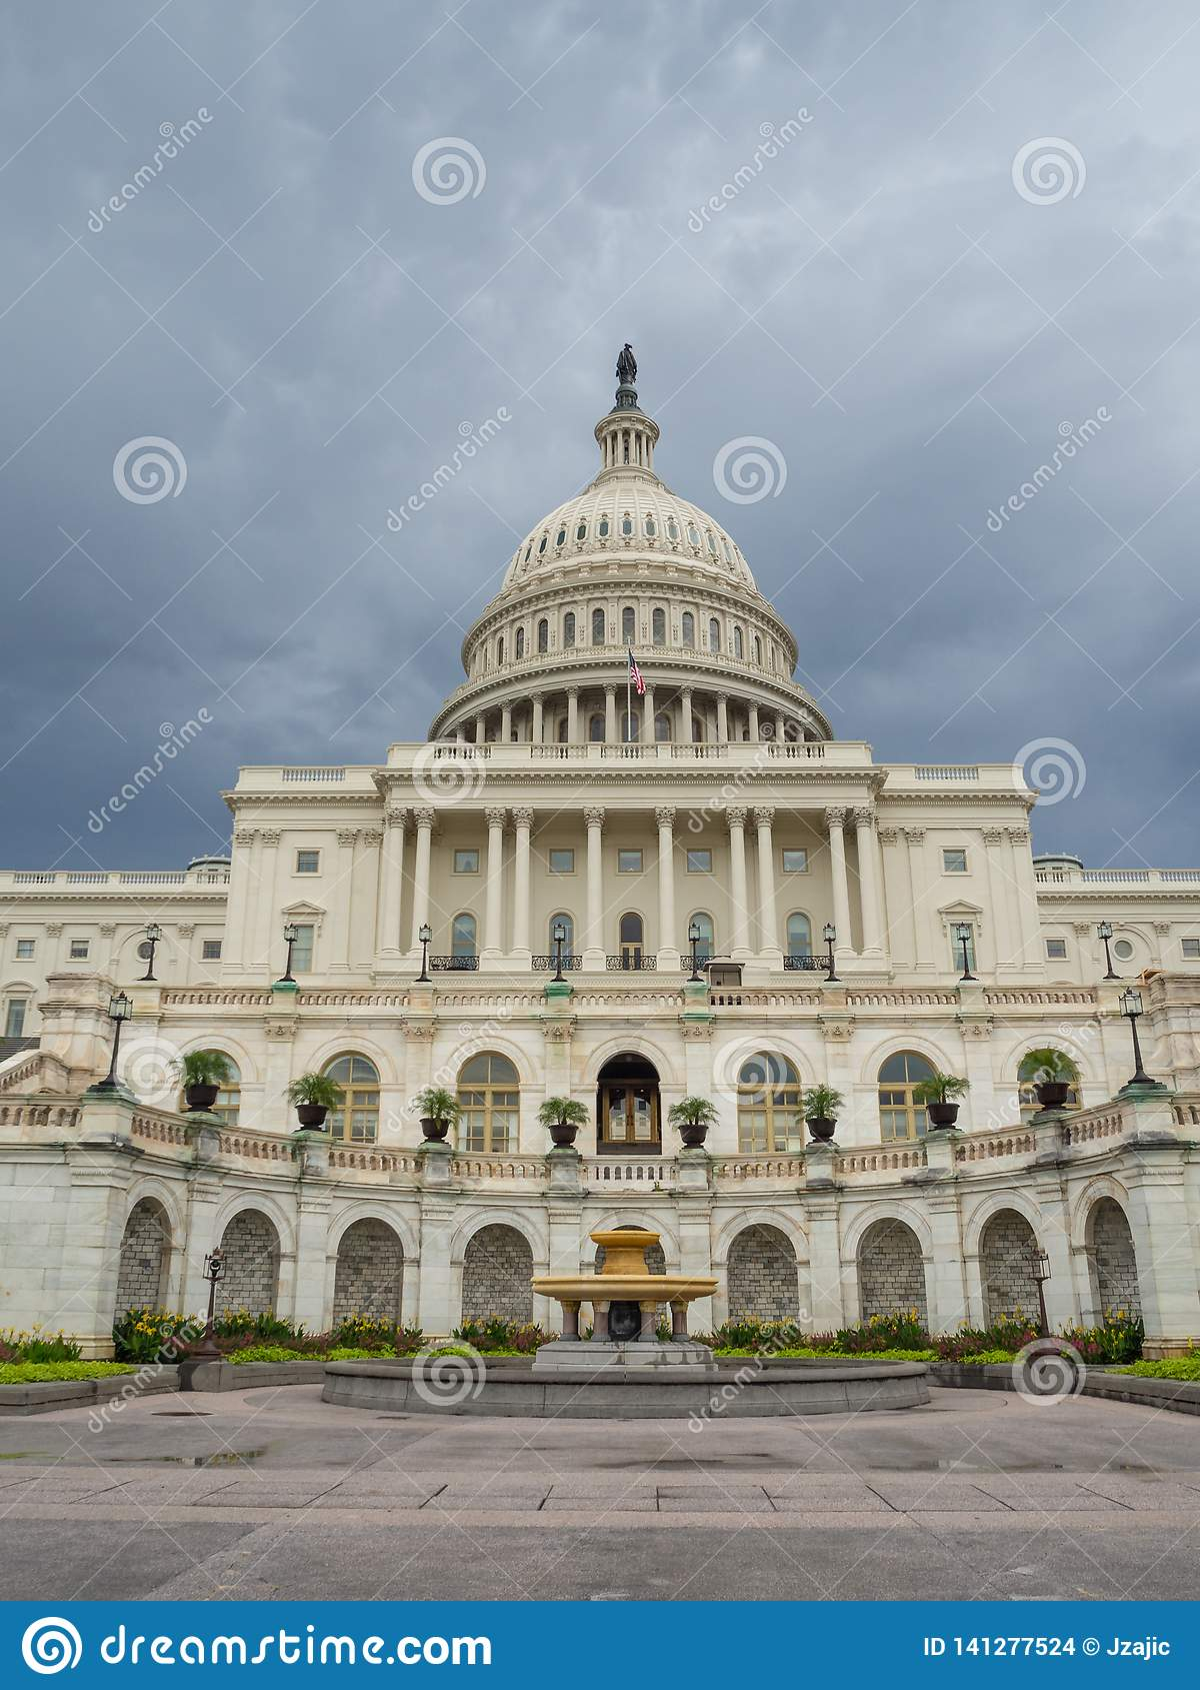 Washington DC, District of Columbia [United States US Capitol Building, shady cloudy weather before raining, faling dusk